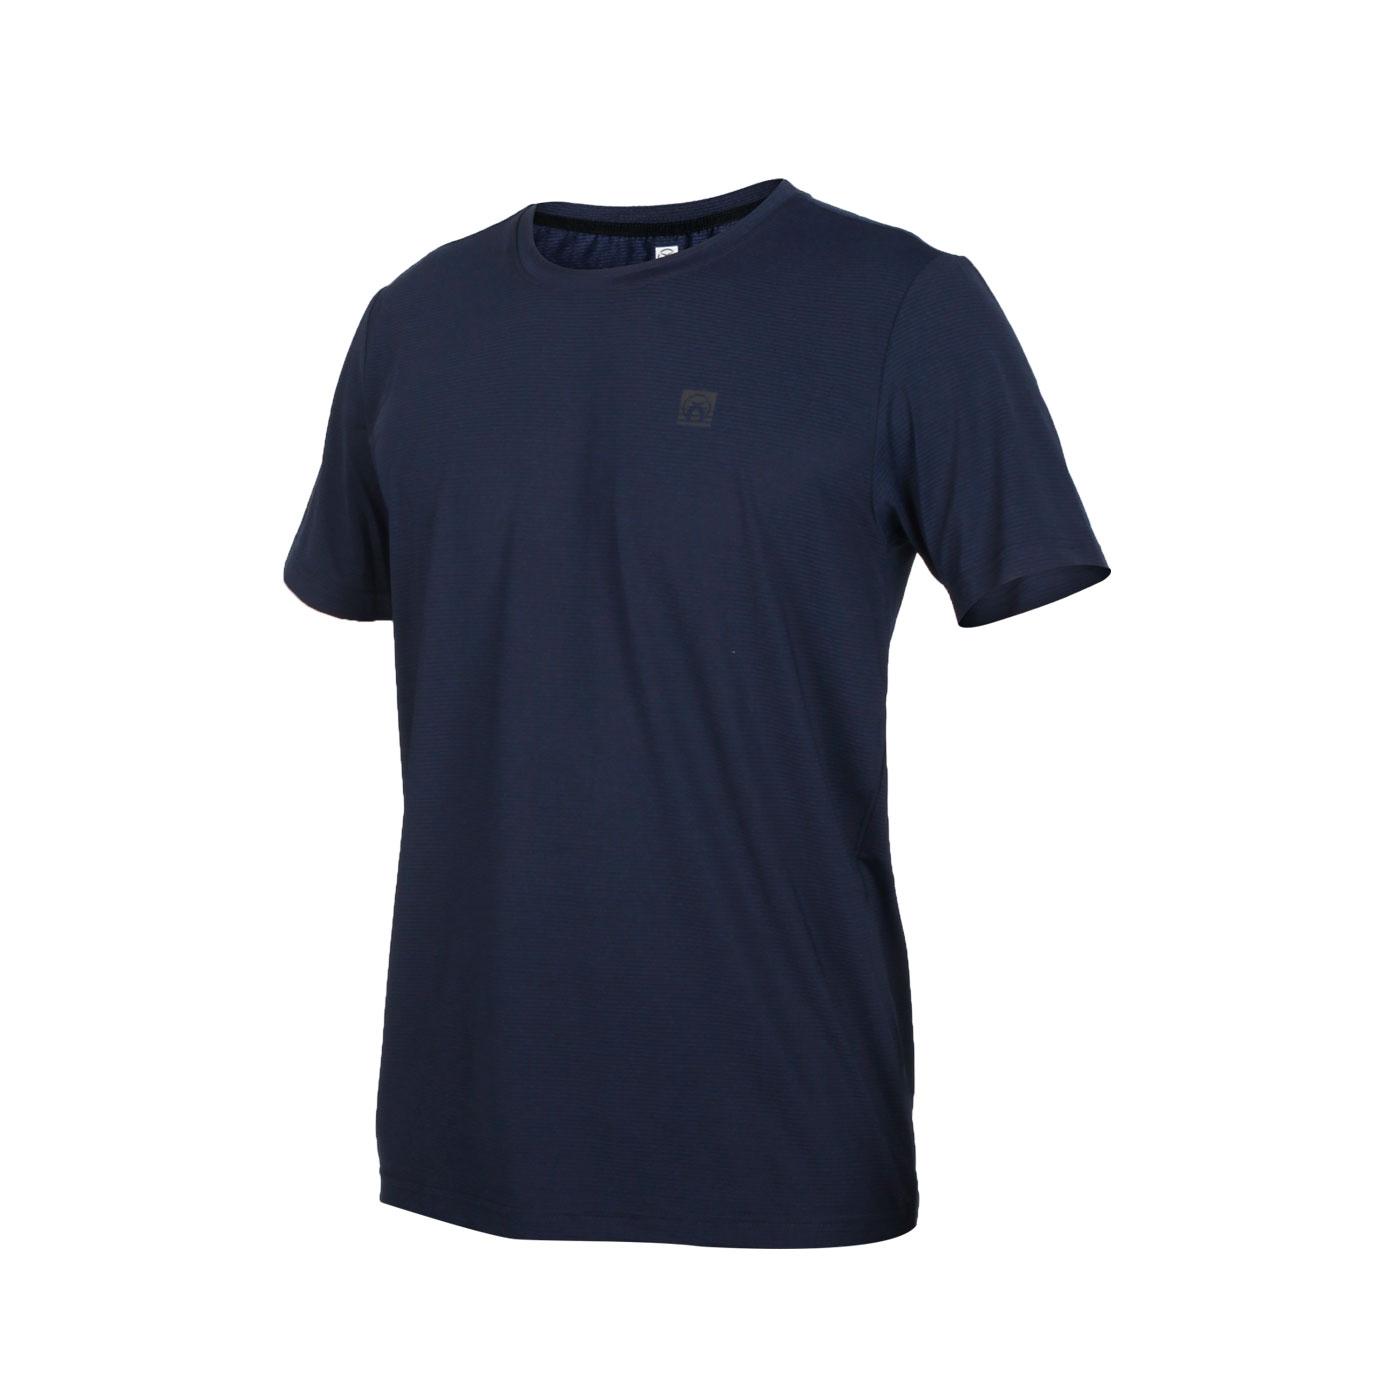 FIRESTAR 男款彈性圓領短袖T恤 D0531-93 - 丈青灰